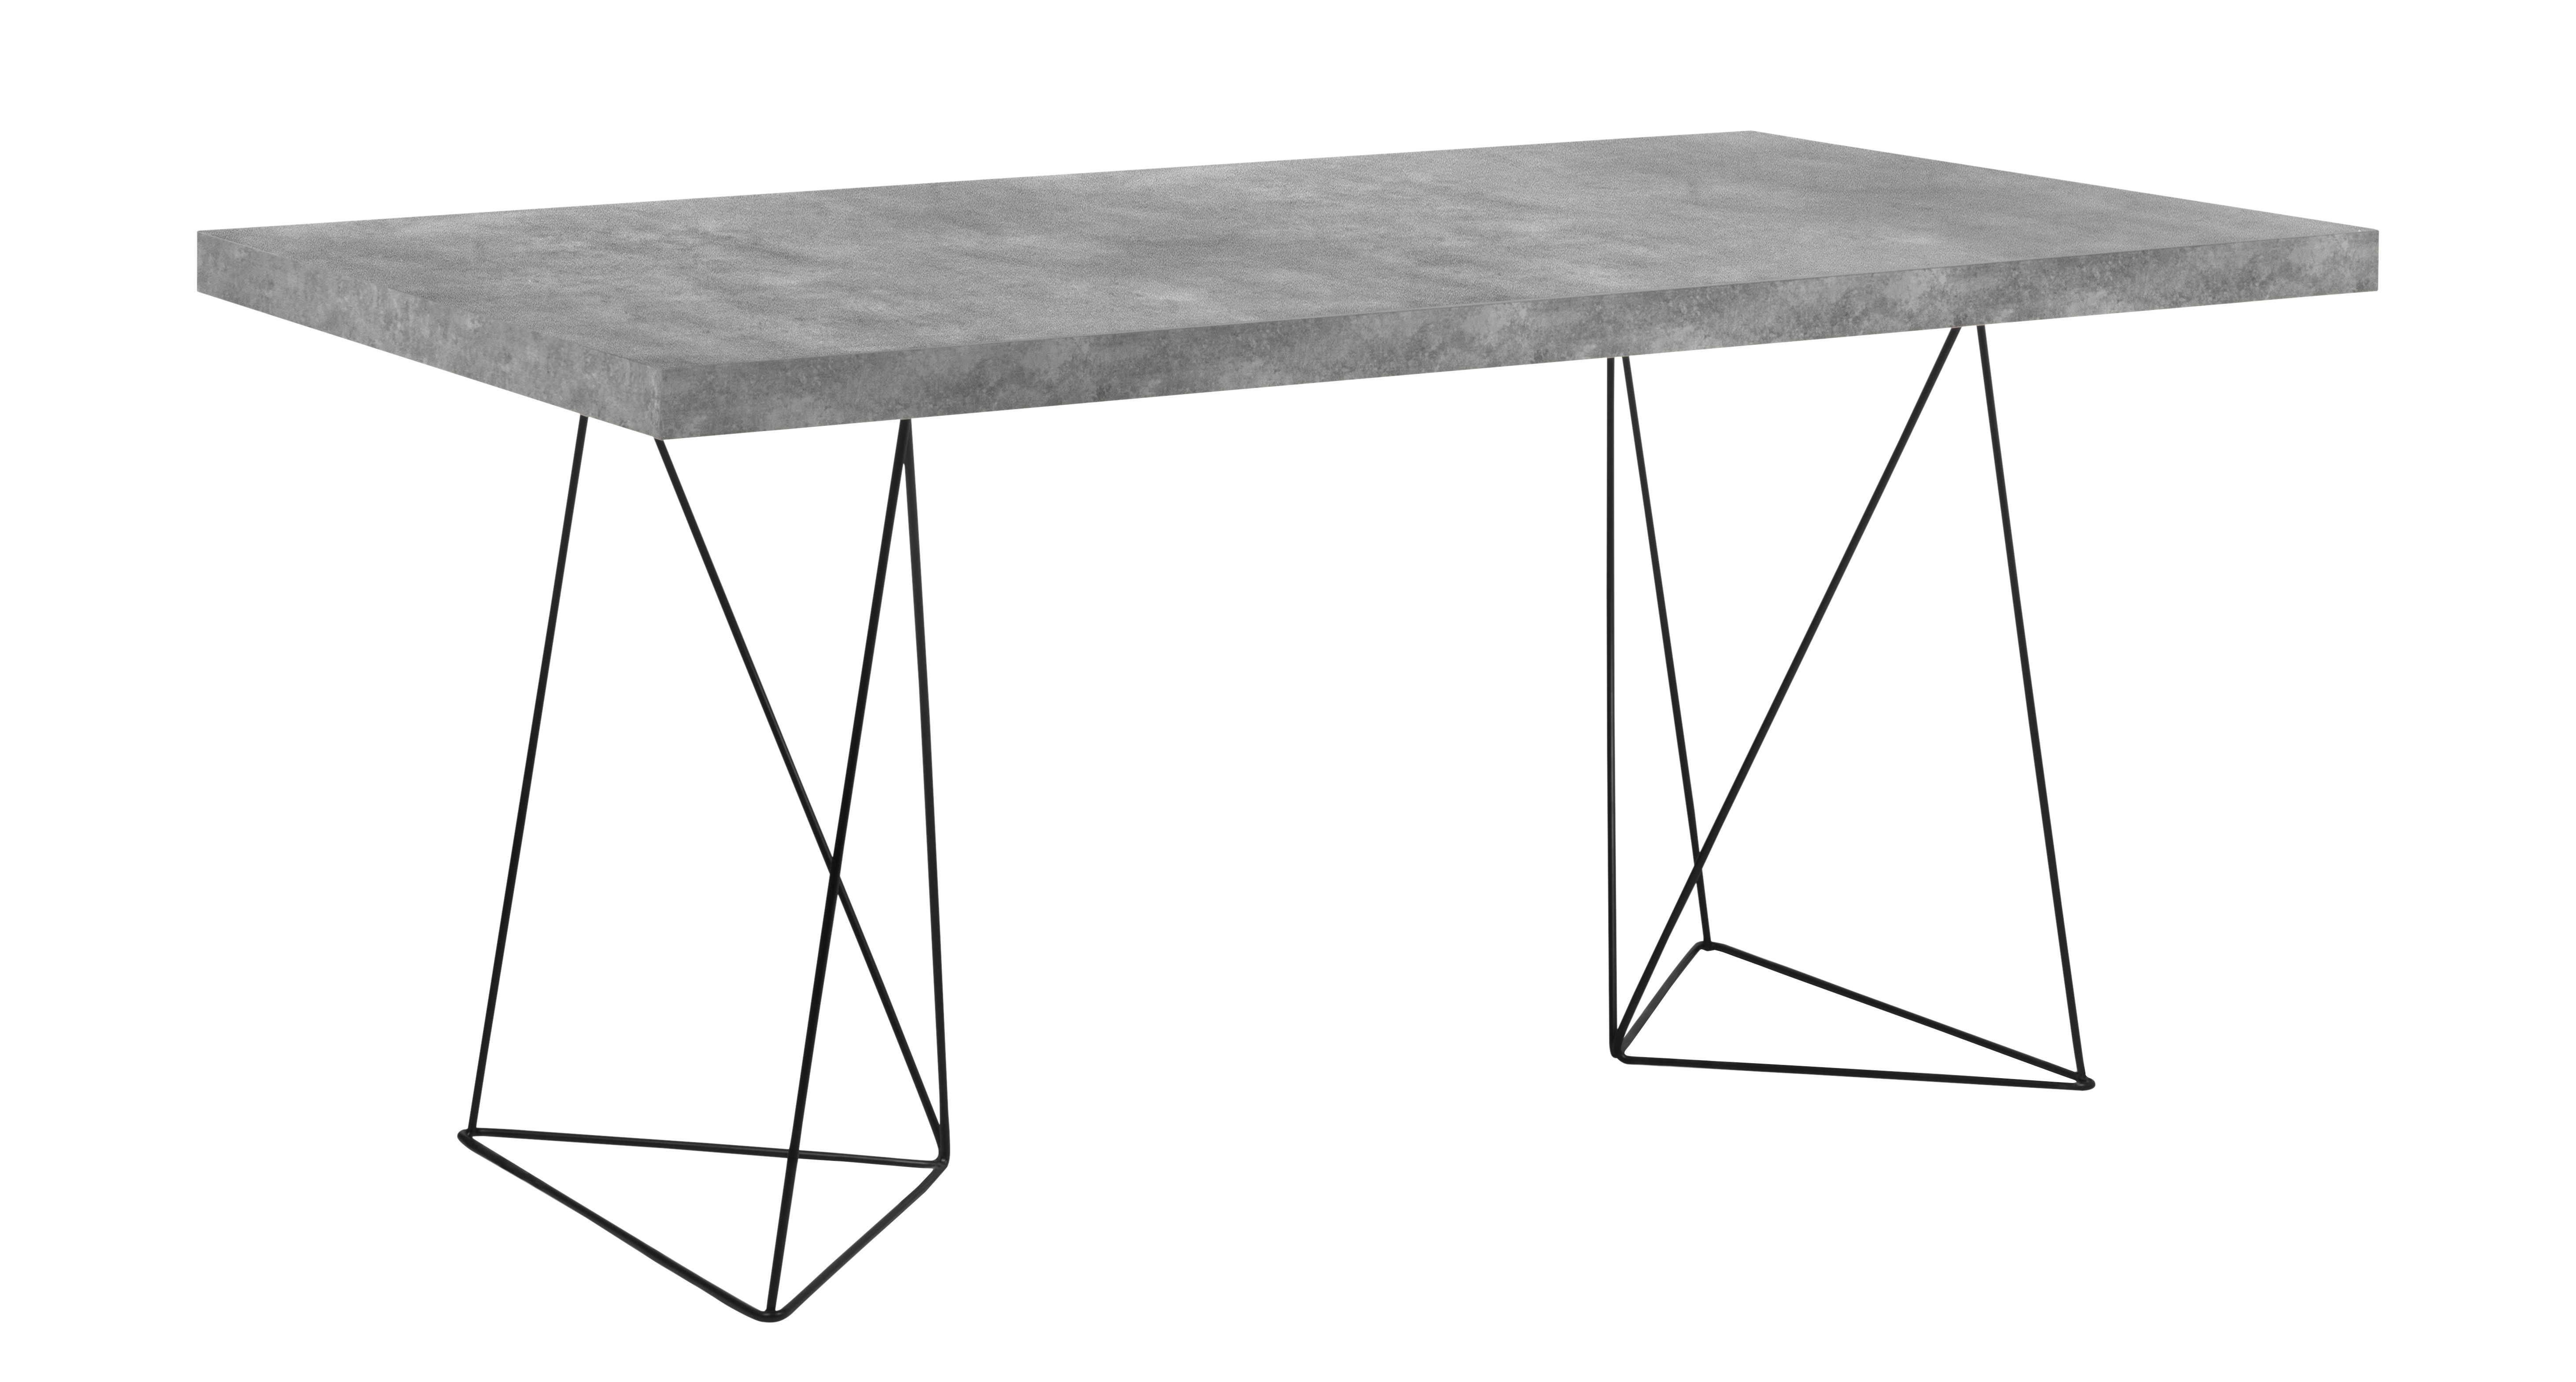 trestle tisch - / l 160 cm - beton-optik beton-optik / tischgestell